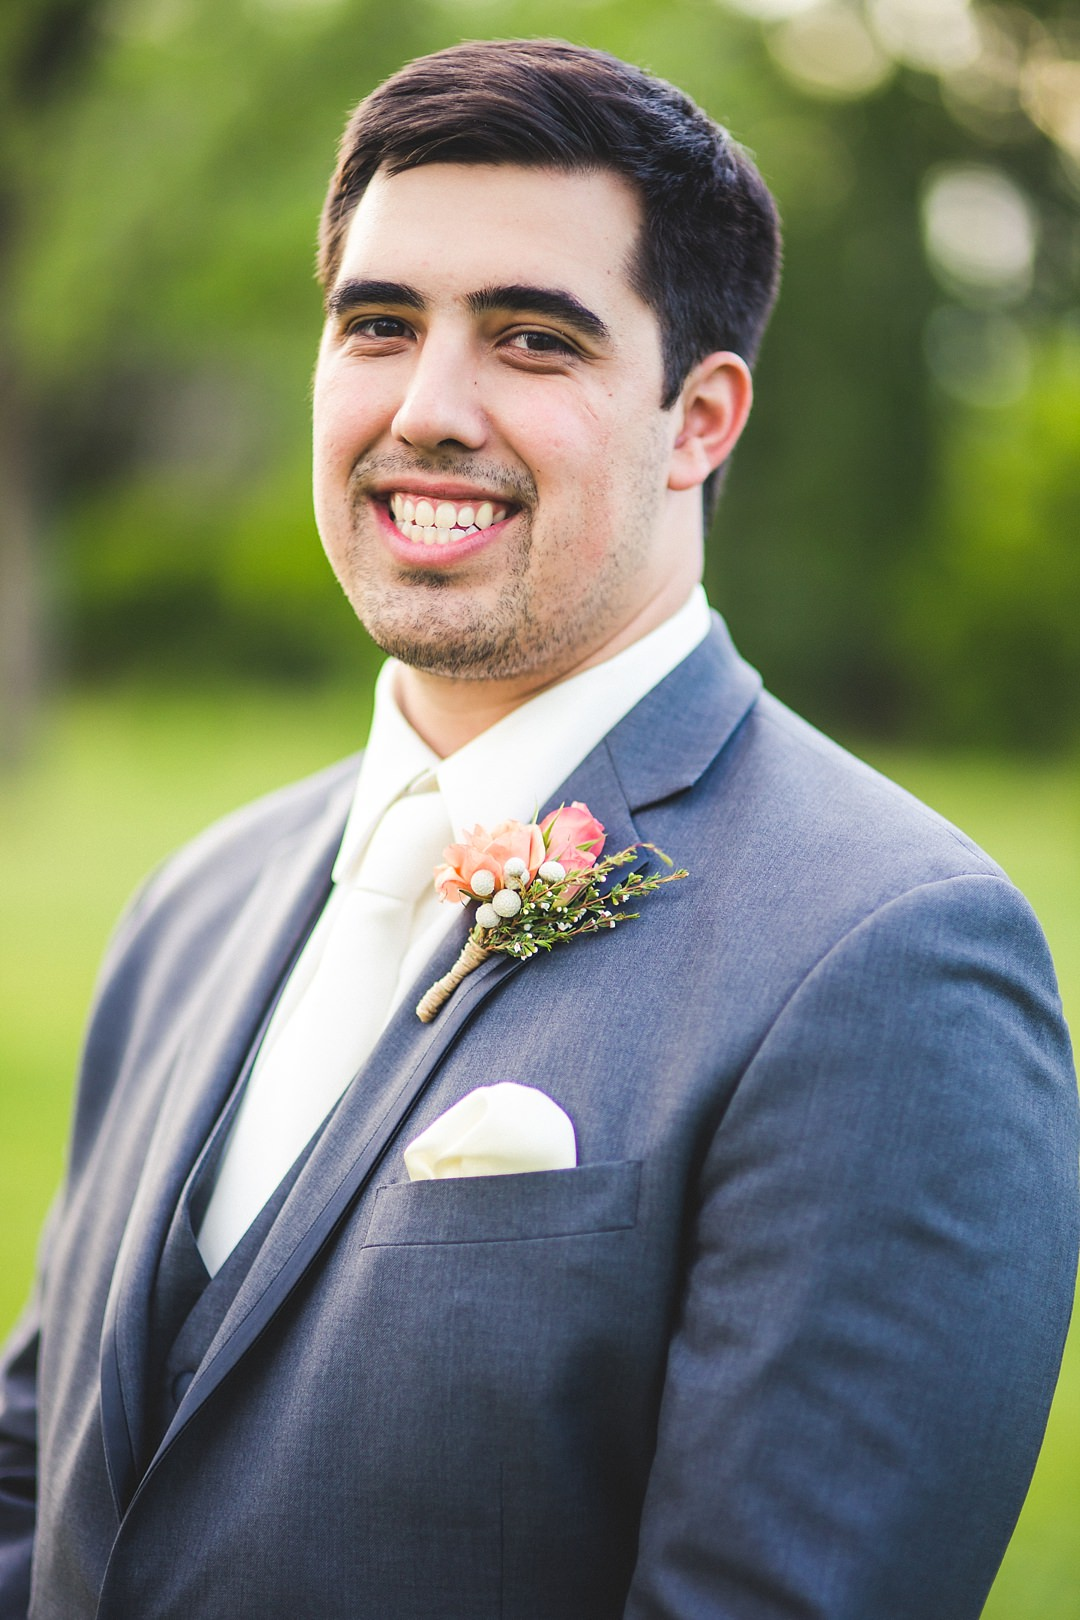 Scott english photo arizona wedding photographer_0144